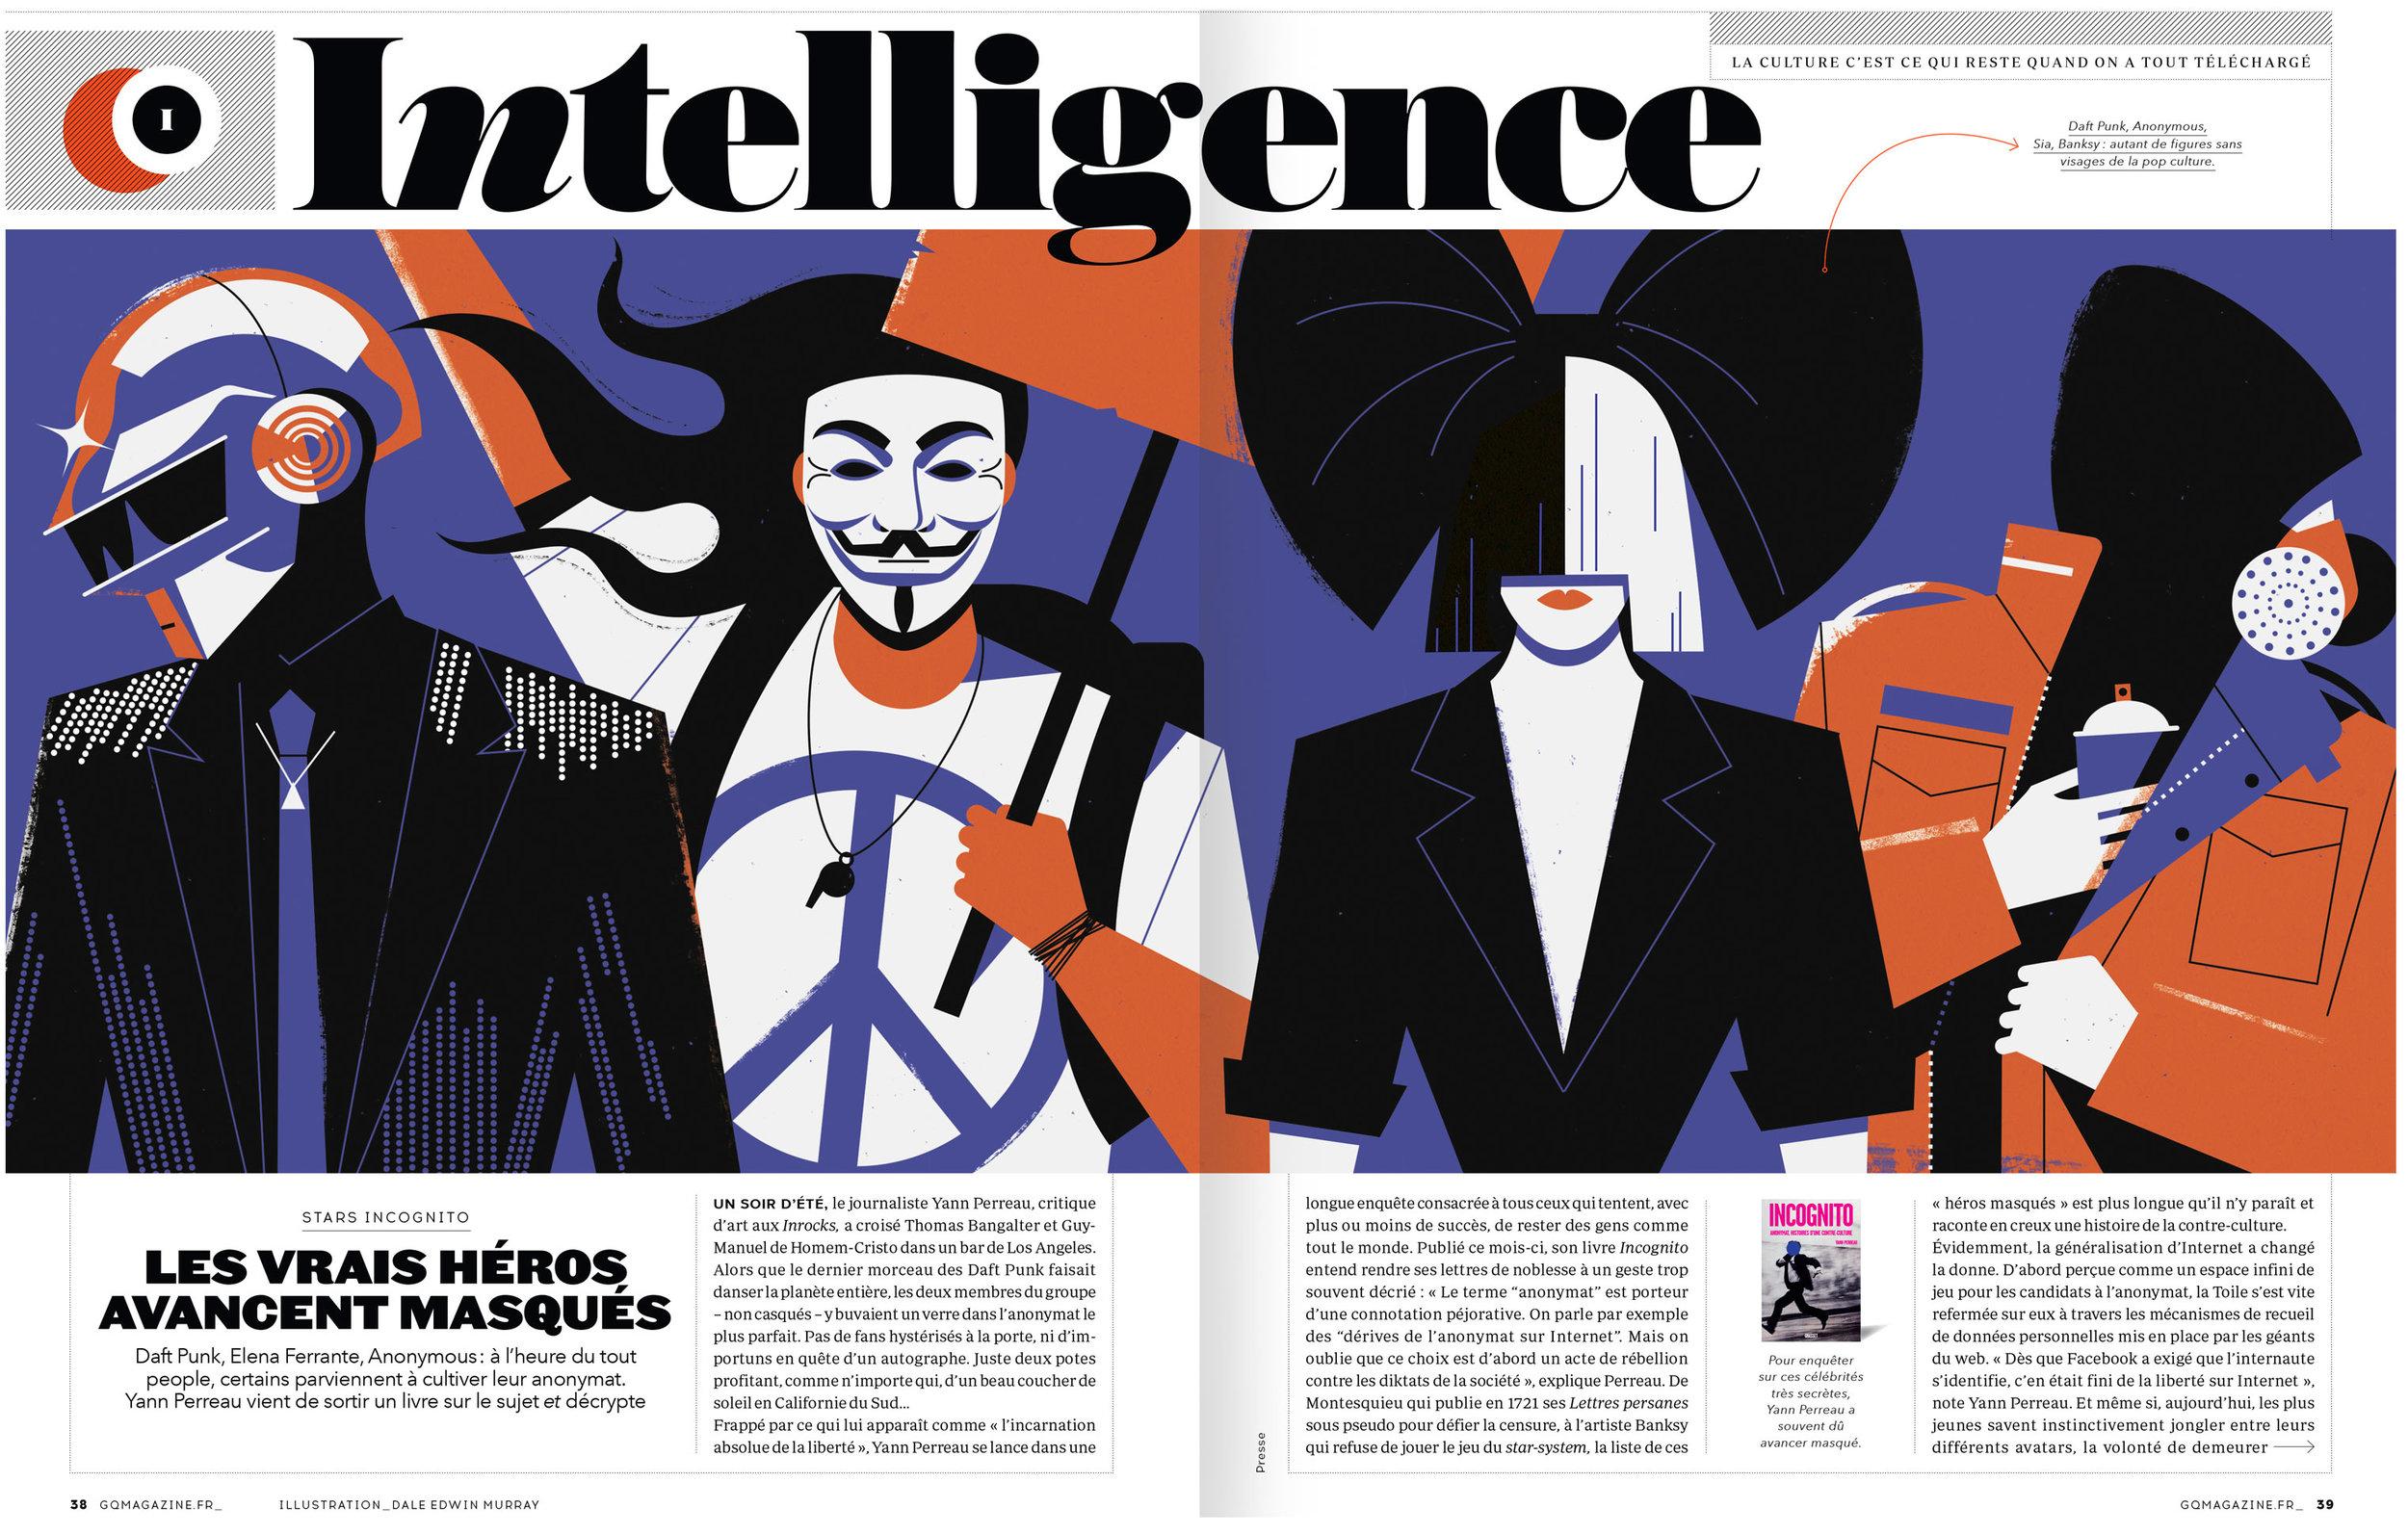 dale edwin murray freelance illustrator GQ France magazine illustration